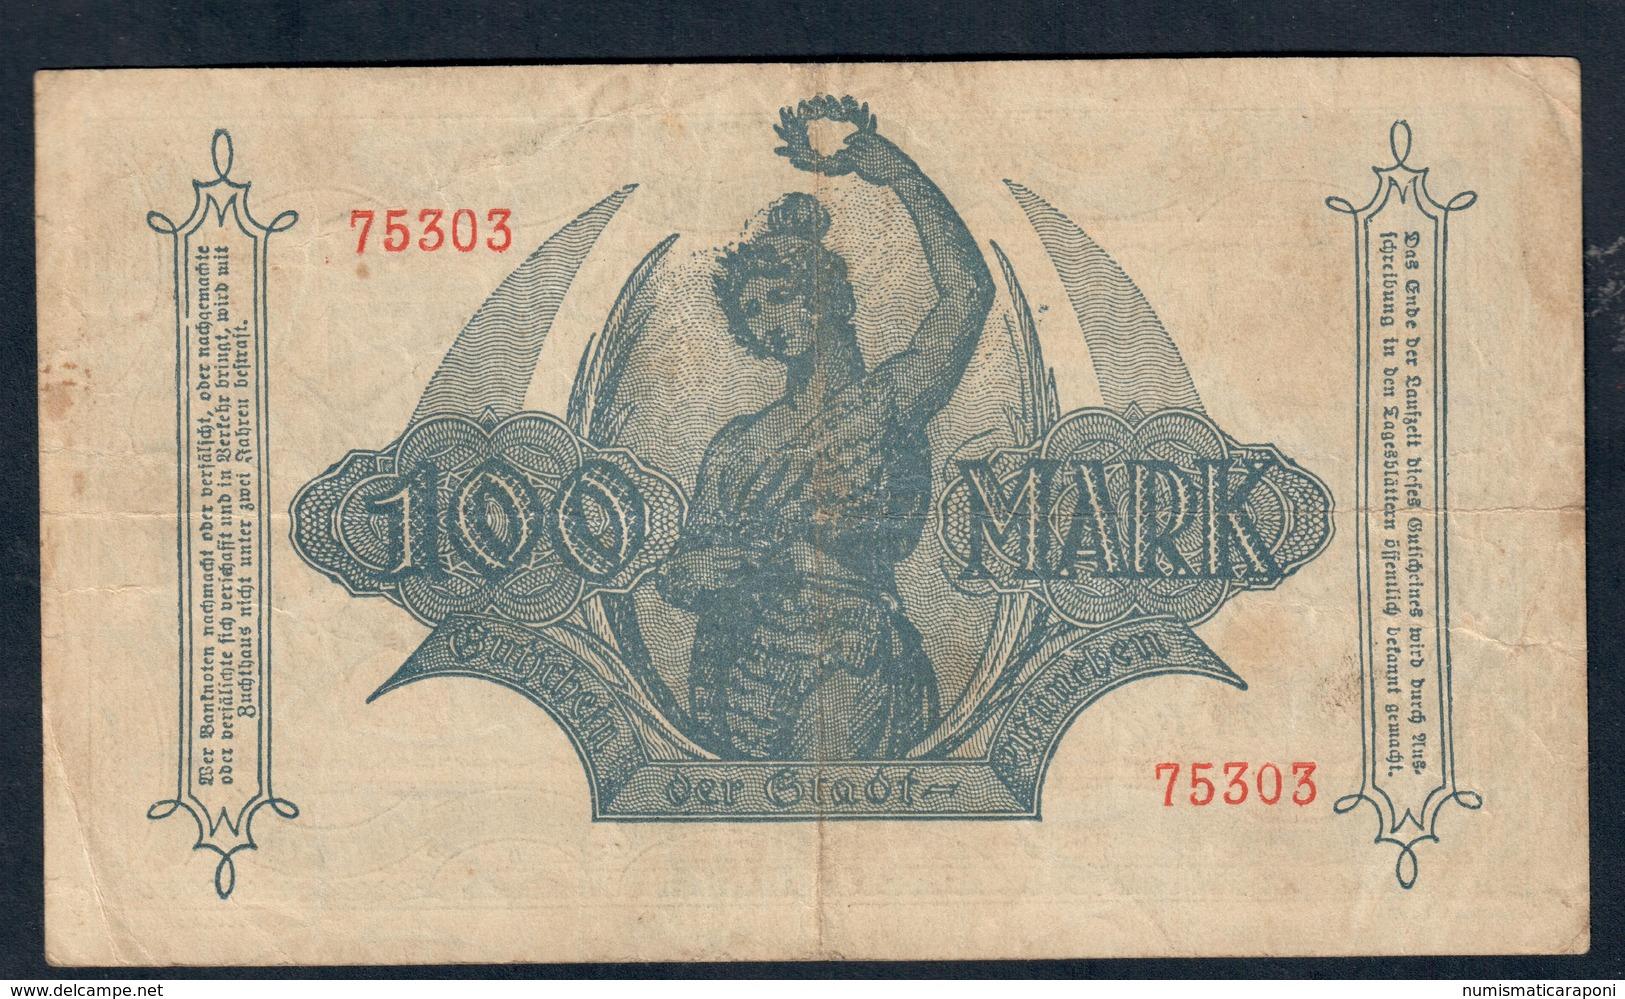 GERMANIA ALEMANIA GERMANY Notgeld Munchen 100 Mark 1922 Lotto 085 - [ 3] 1918-1933 : Repubblica  Di Weimar